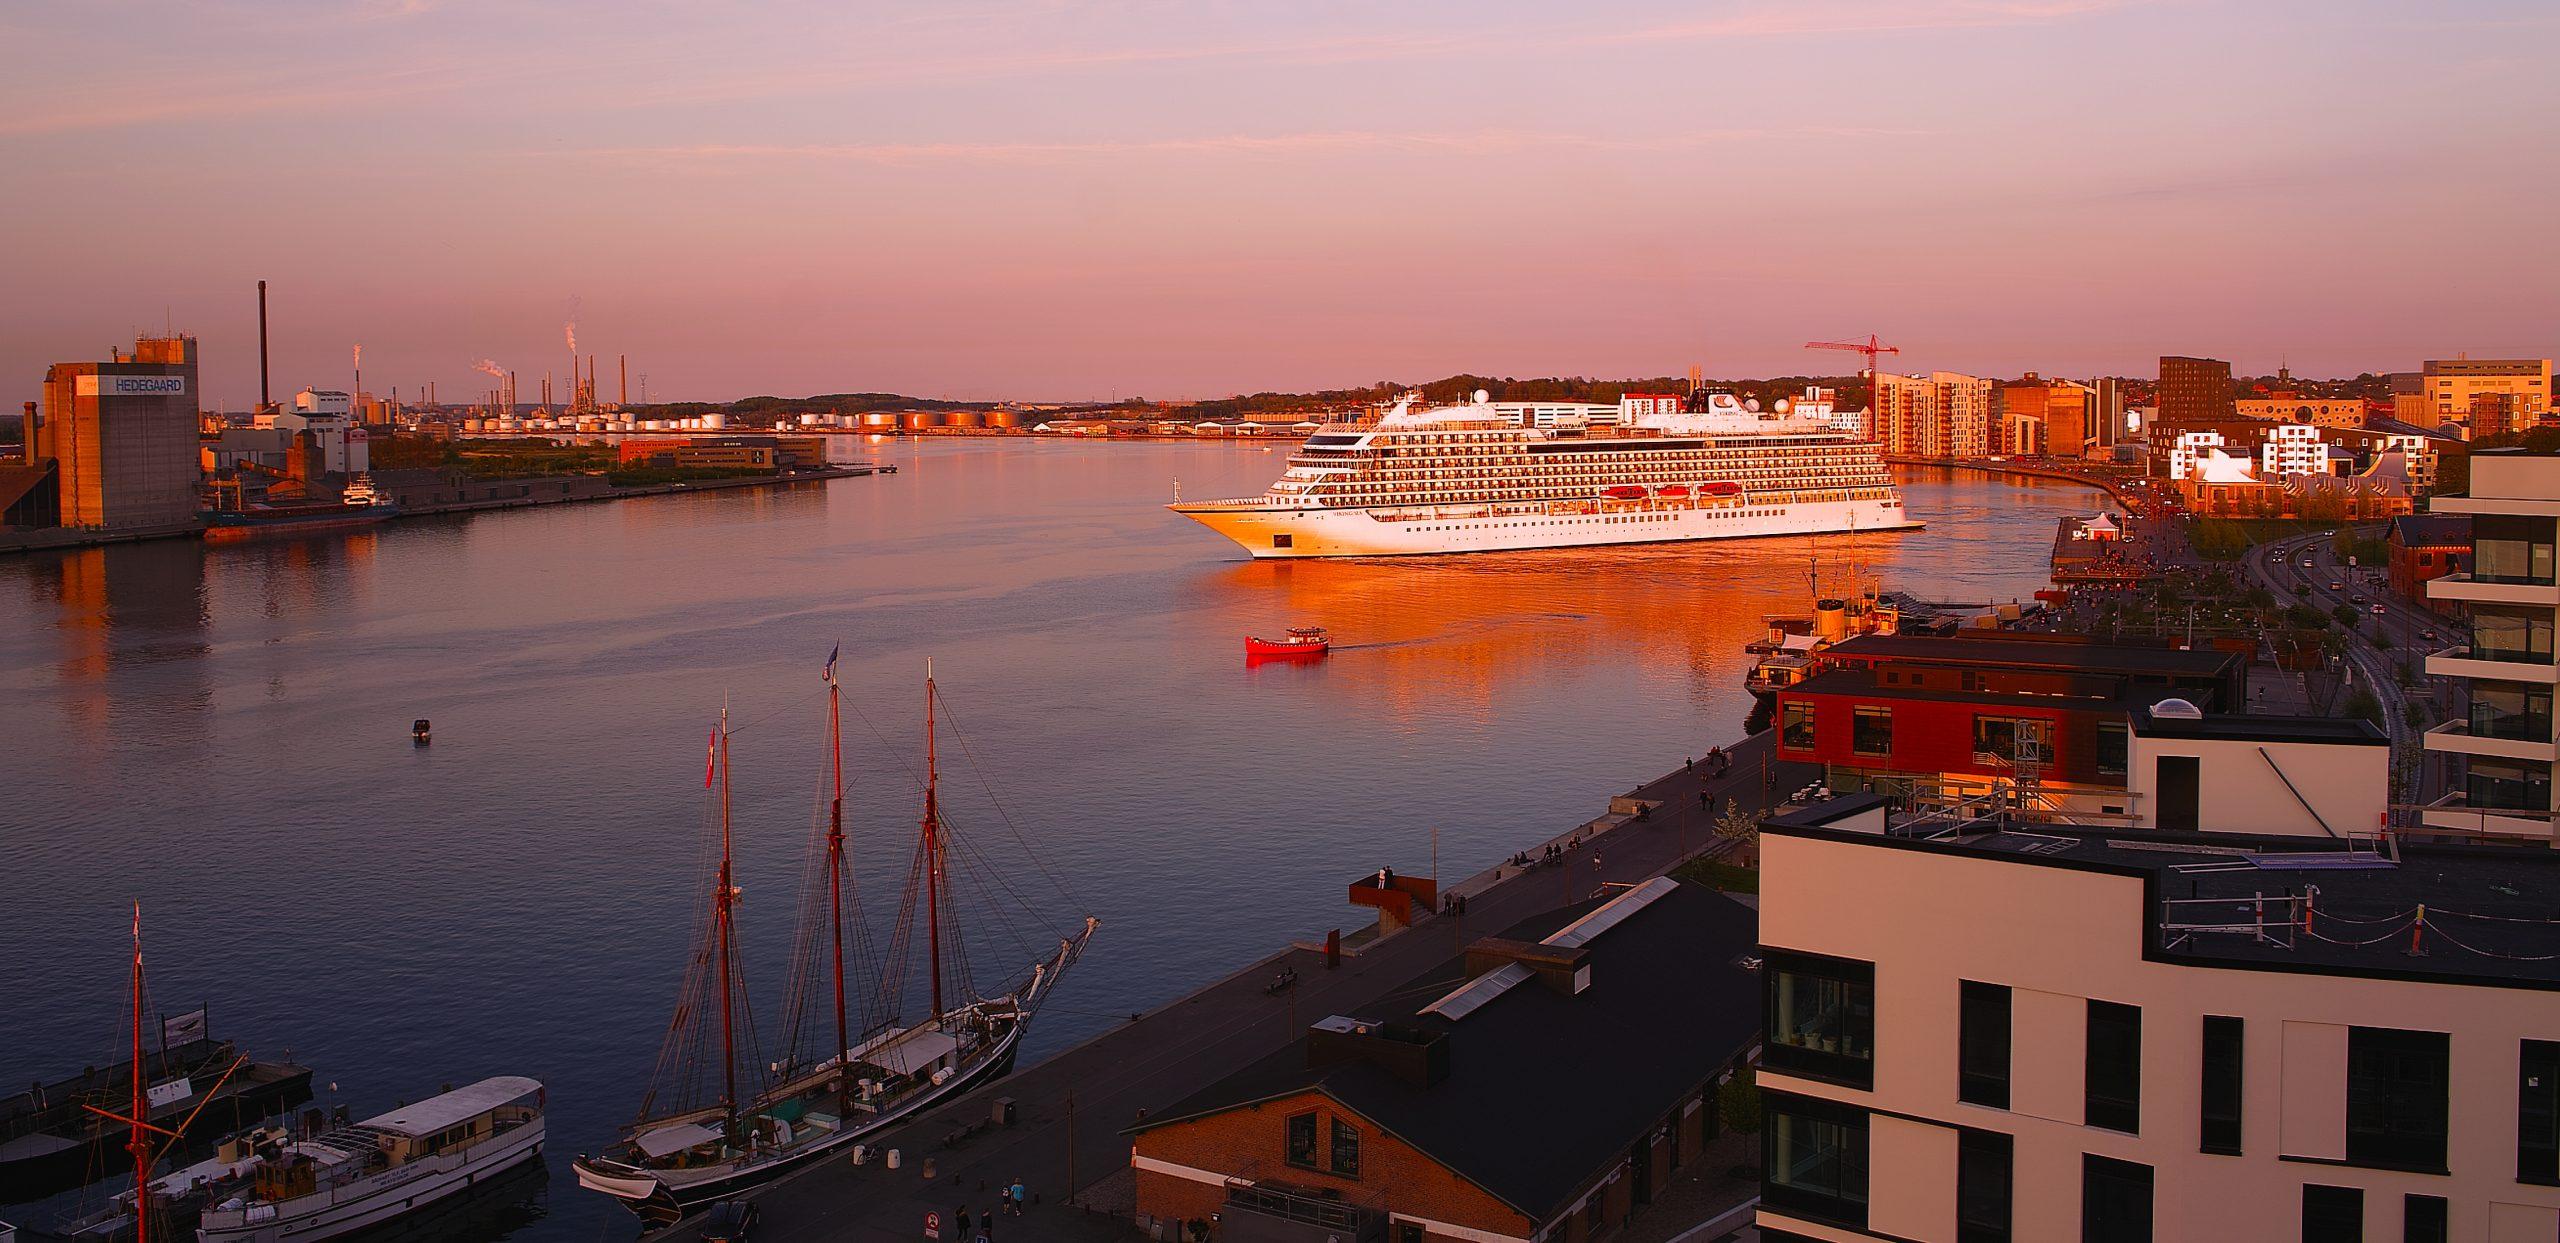 Krydstogtskibet Viking Sea på besøg i Aalborg. (Foto: VisitAalborg)